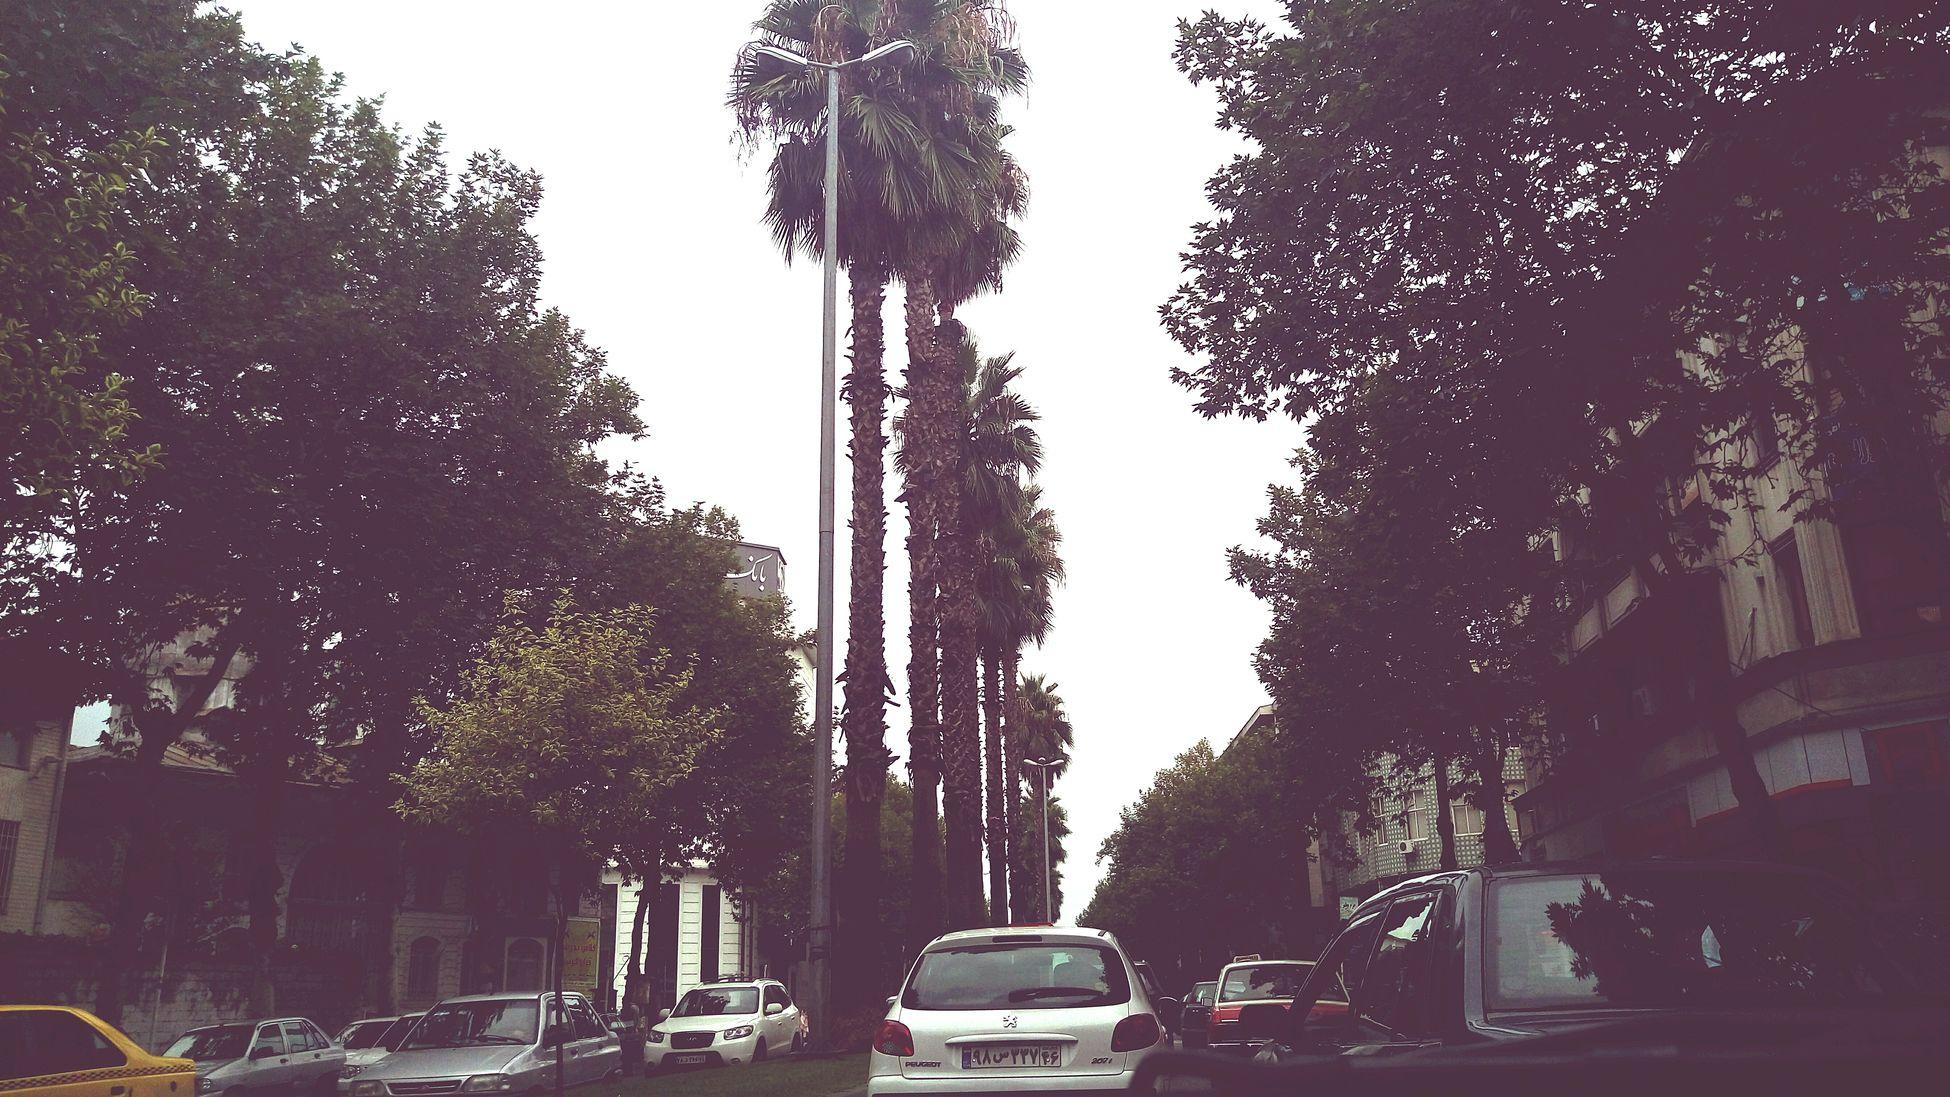 Rasht, a must visit city ❤🆒💯@ Rasht Guilan Iran ... Urban Heart Of Iran Beauty City Life Street Cosmopolitan City Northern Iran Near Caspian Sea رشت گیلان ایران